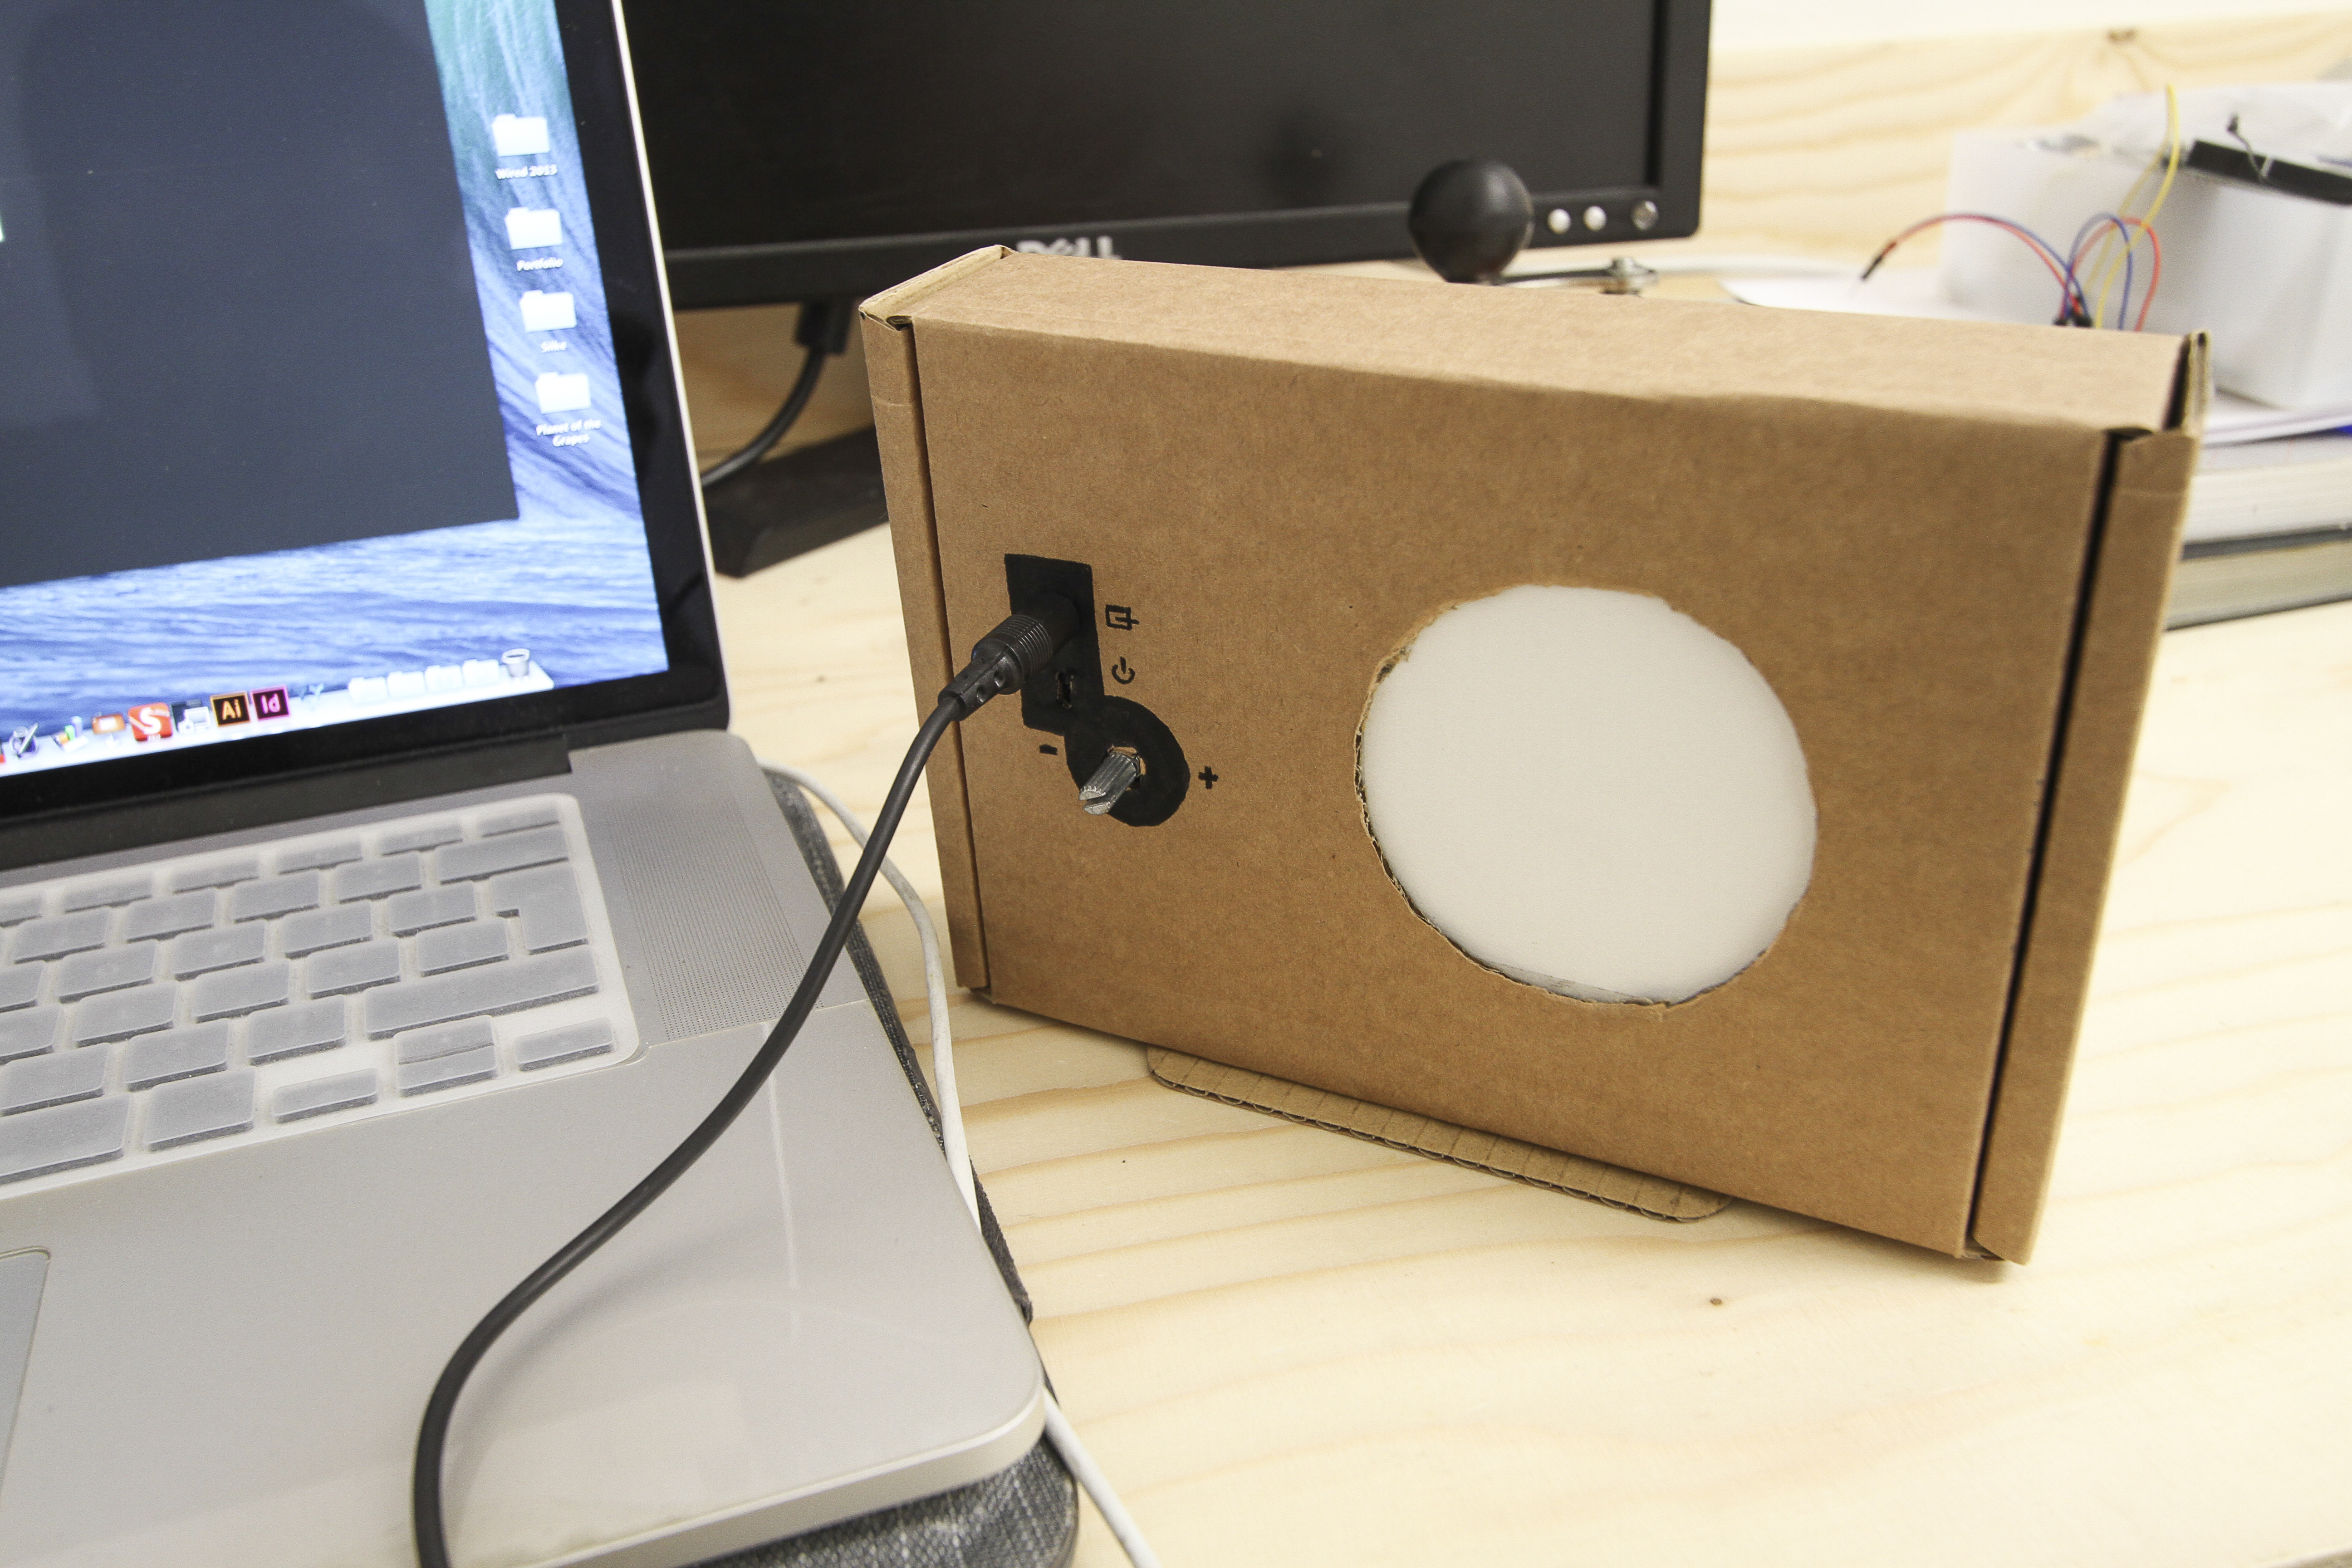 TWSU DIY Speaker Kit (Cardboard Speaker)